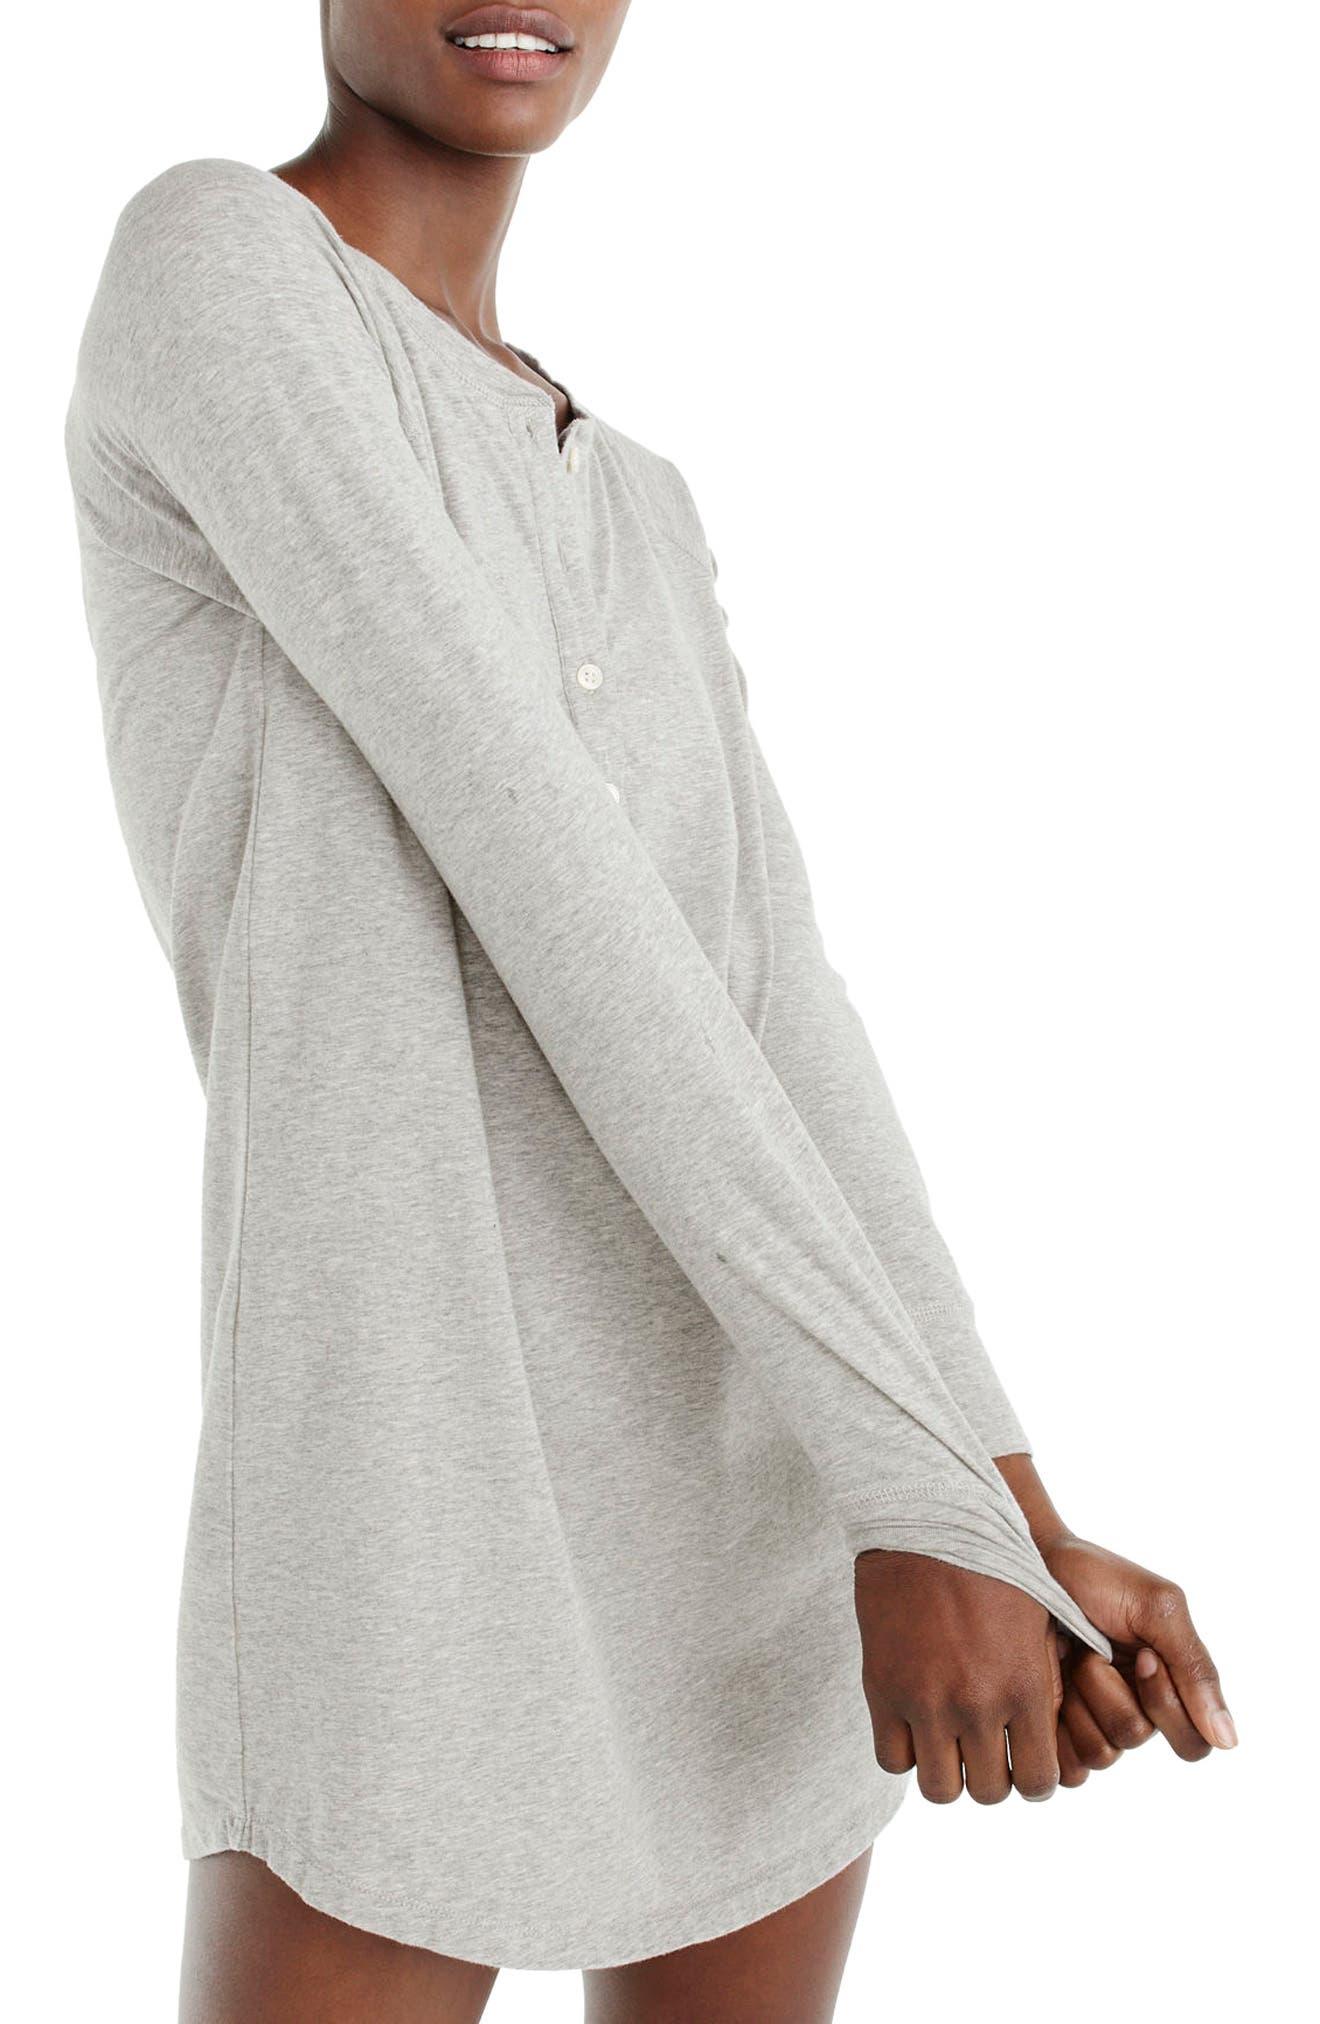 Knit Sleep Shirt,                             Alternate thumbnail 2, color,                             Heather Grey